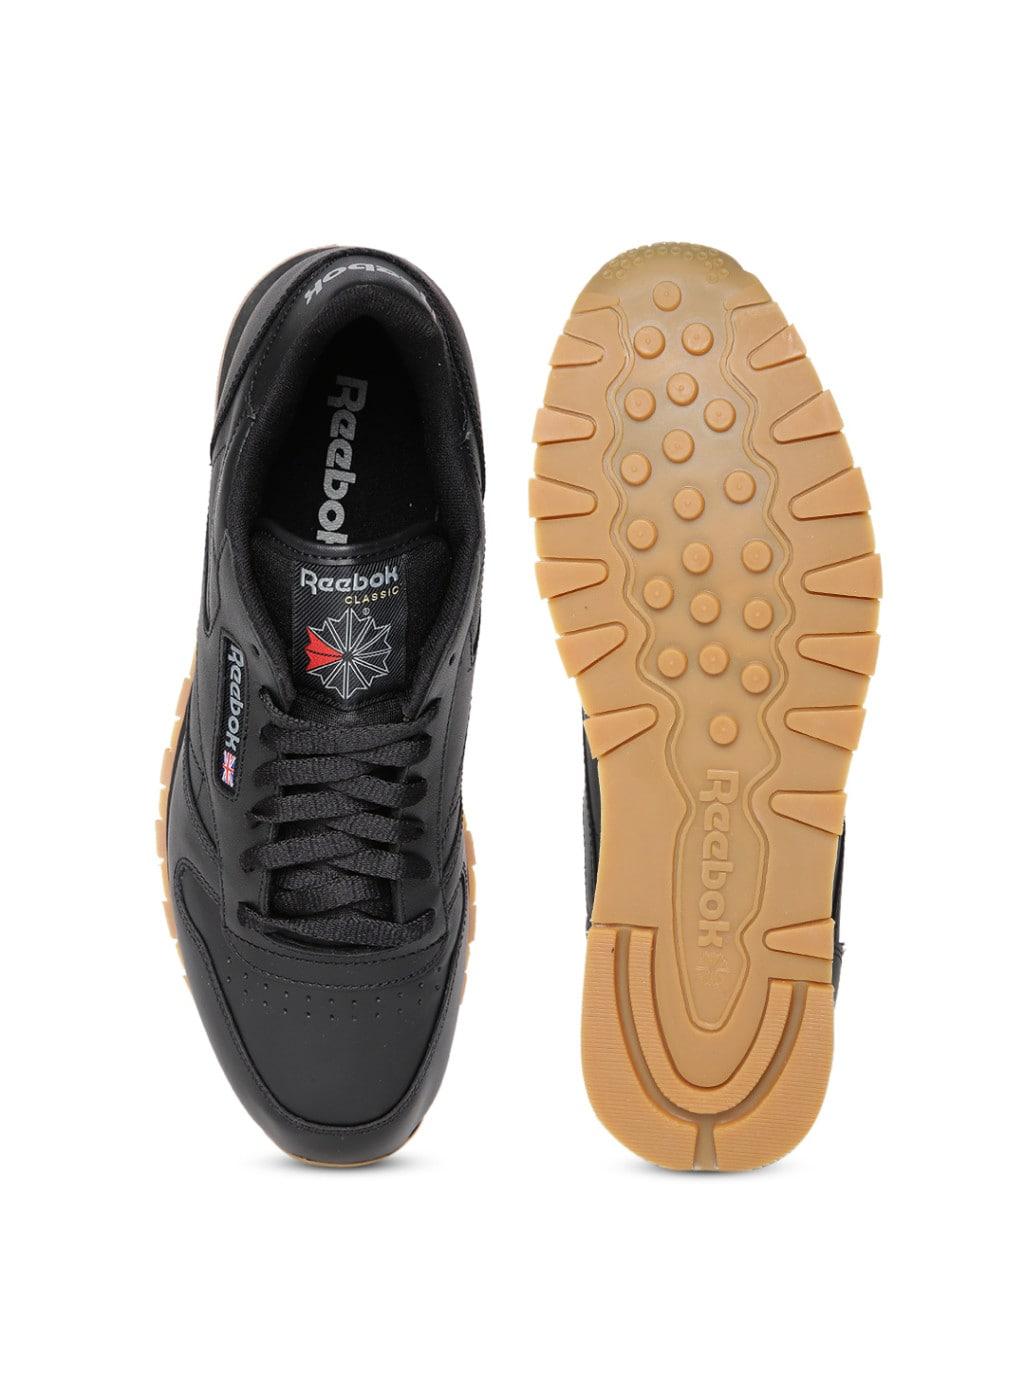 b22499bda Reebok Black Casual Shoes - Buy Reebok Black Casual Shoes online in India -  Jabong